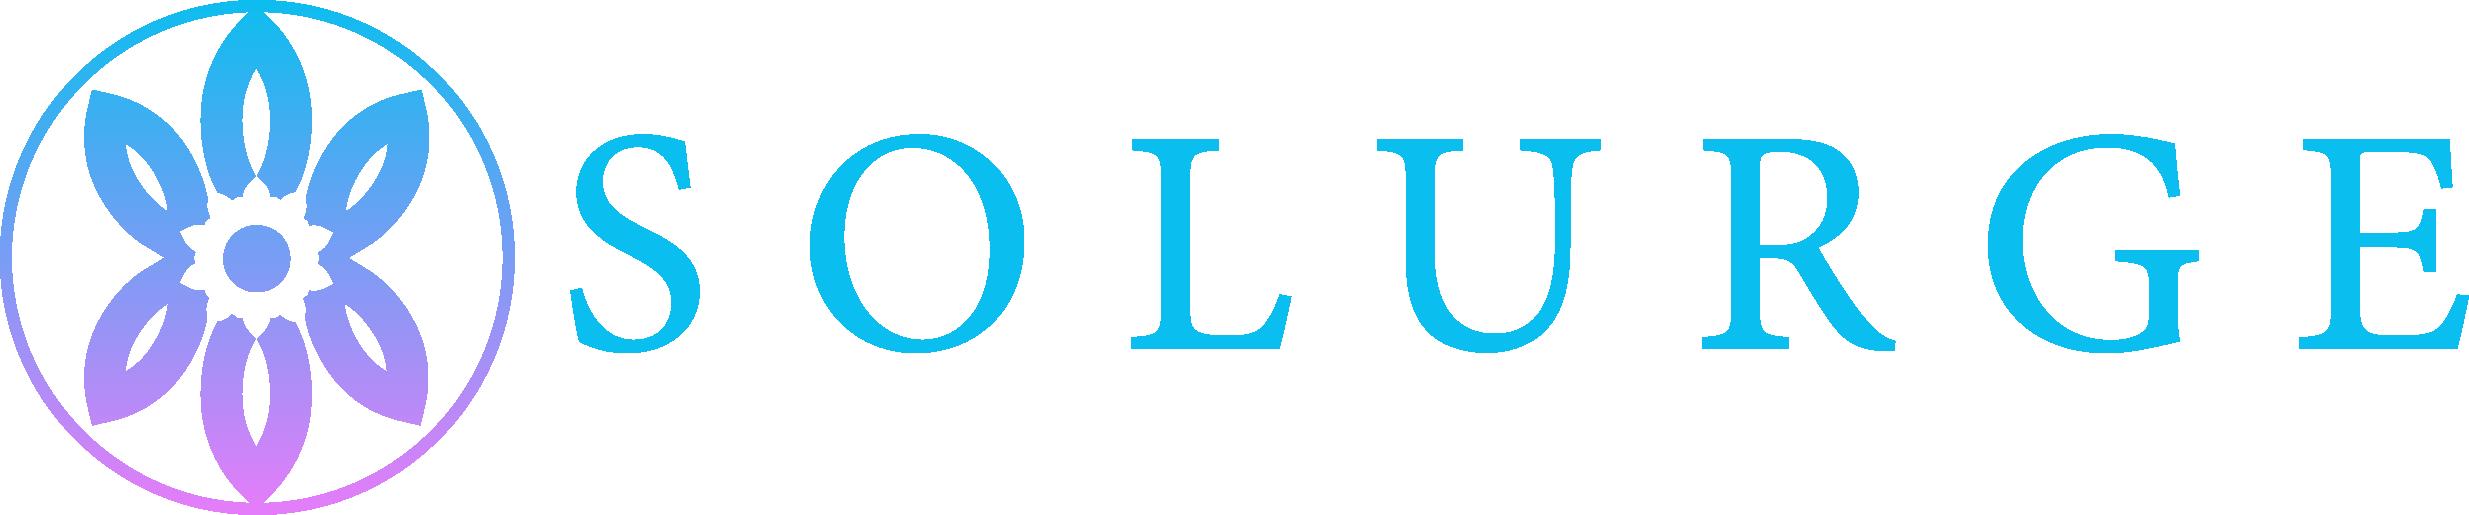 Solurge horizontal logo.png